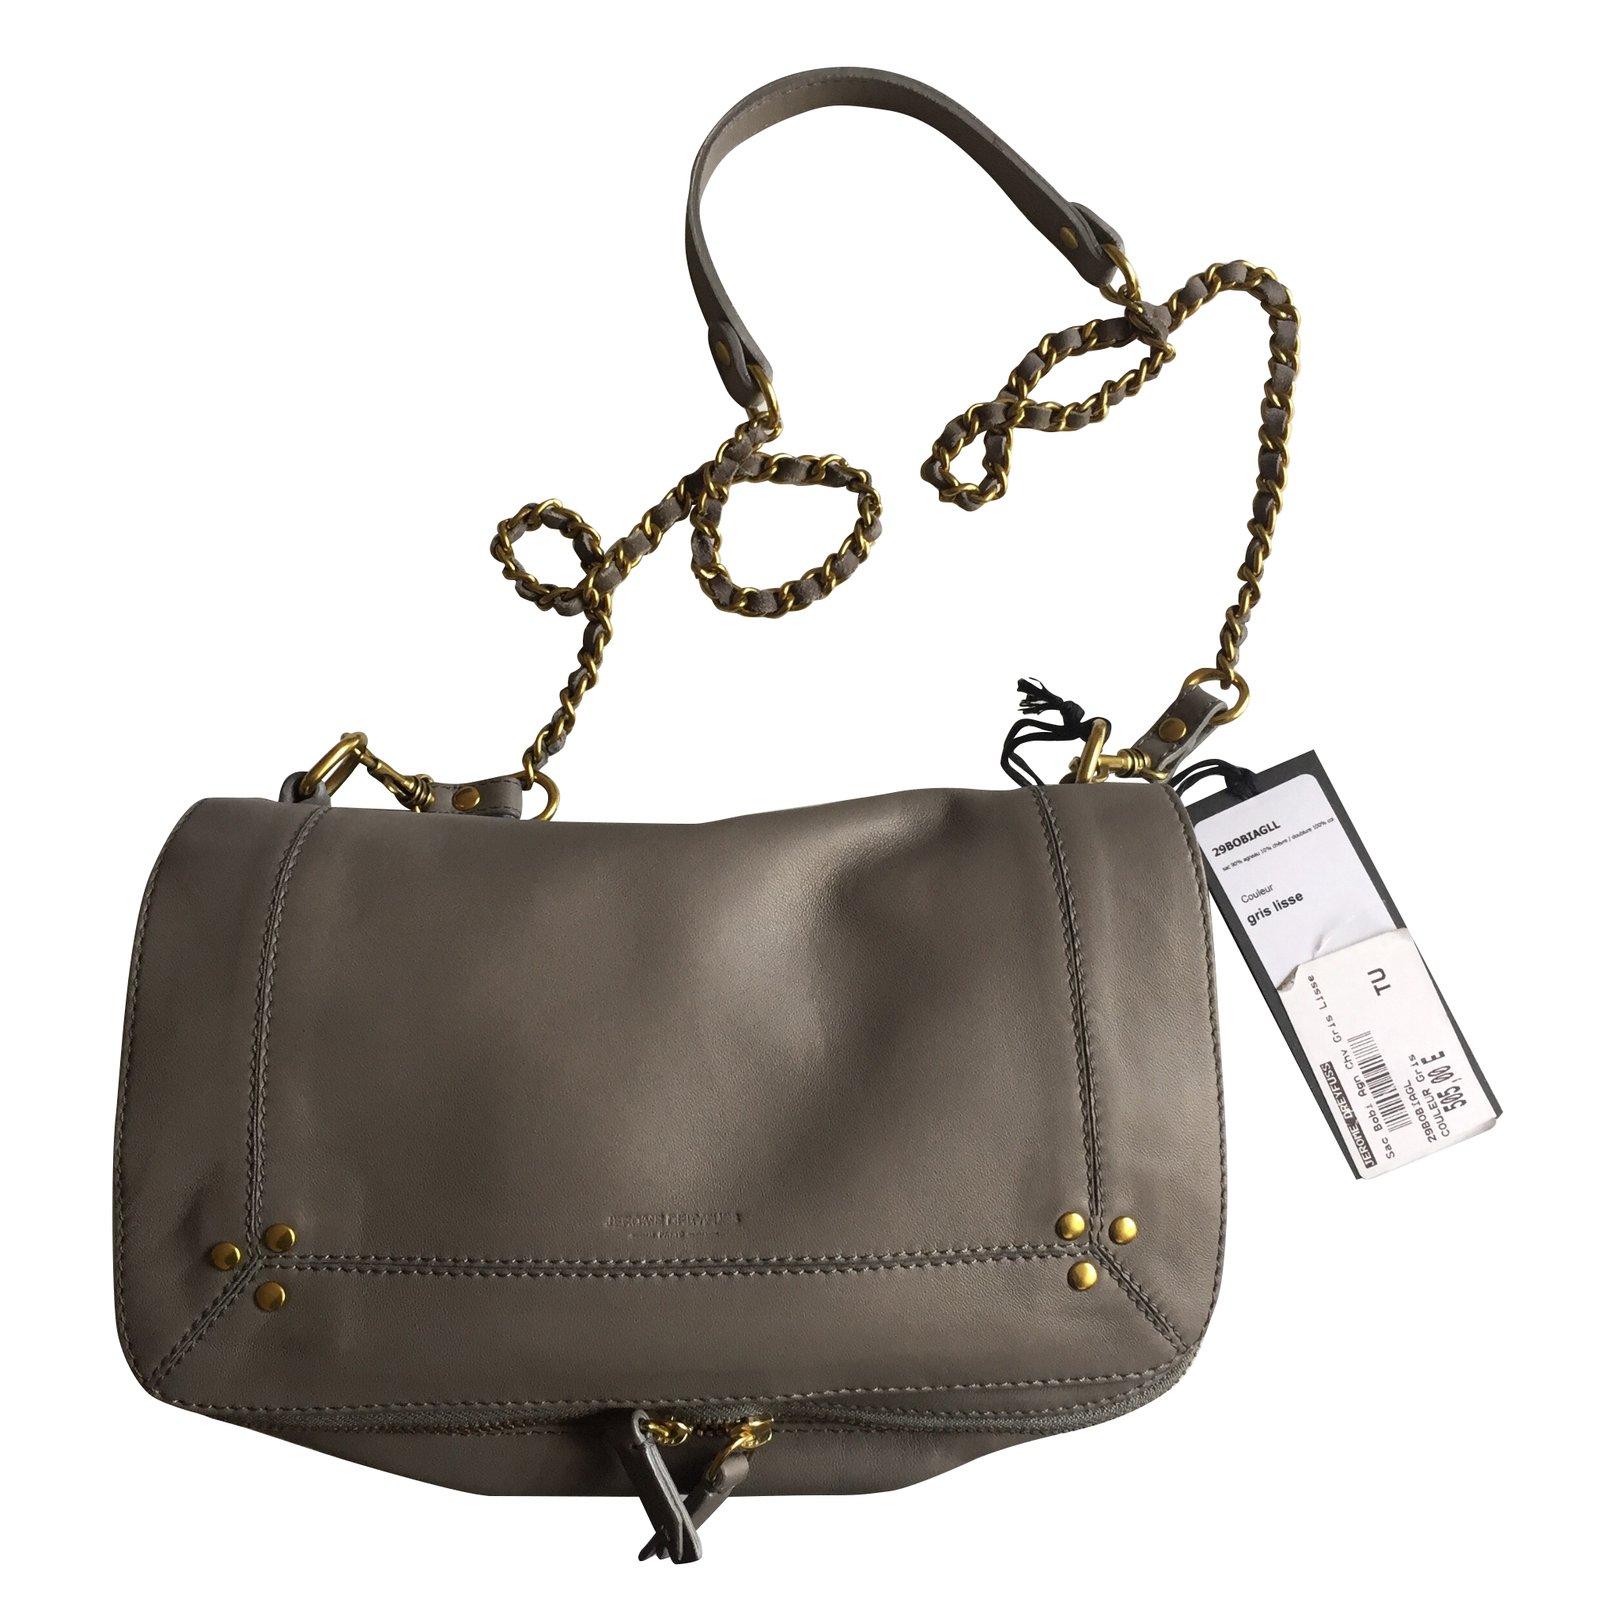 Jerome Dreyfuss Bobi Bag Handbags Leather Grey Ref 55059